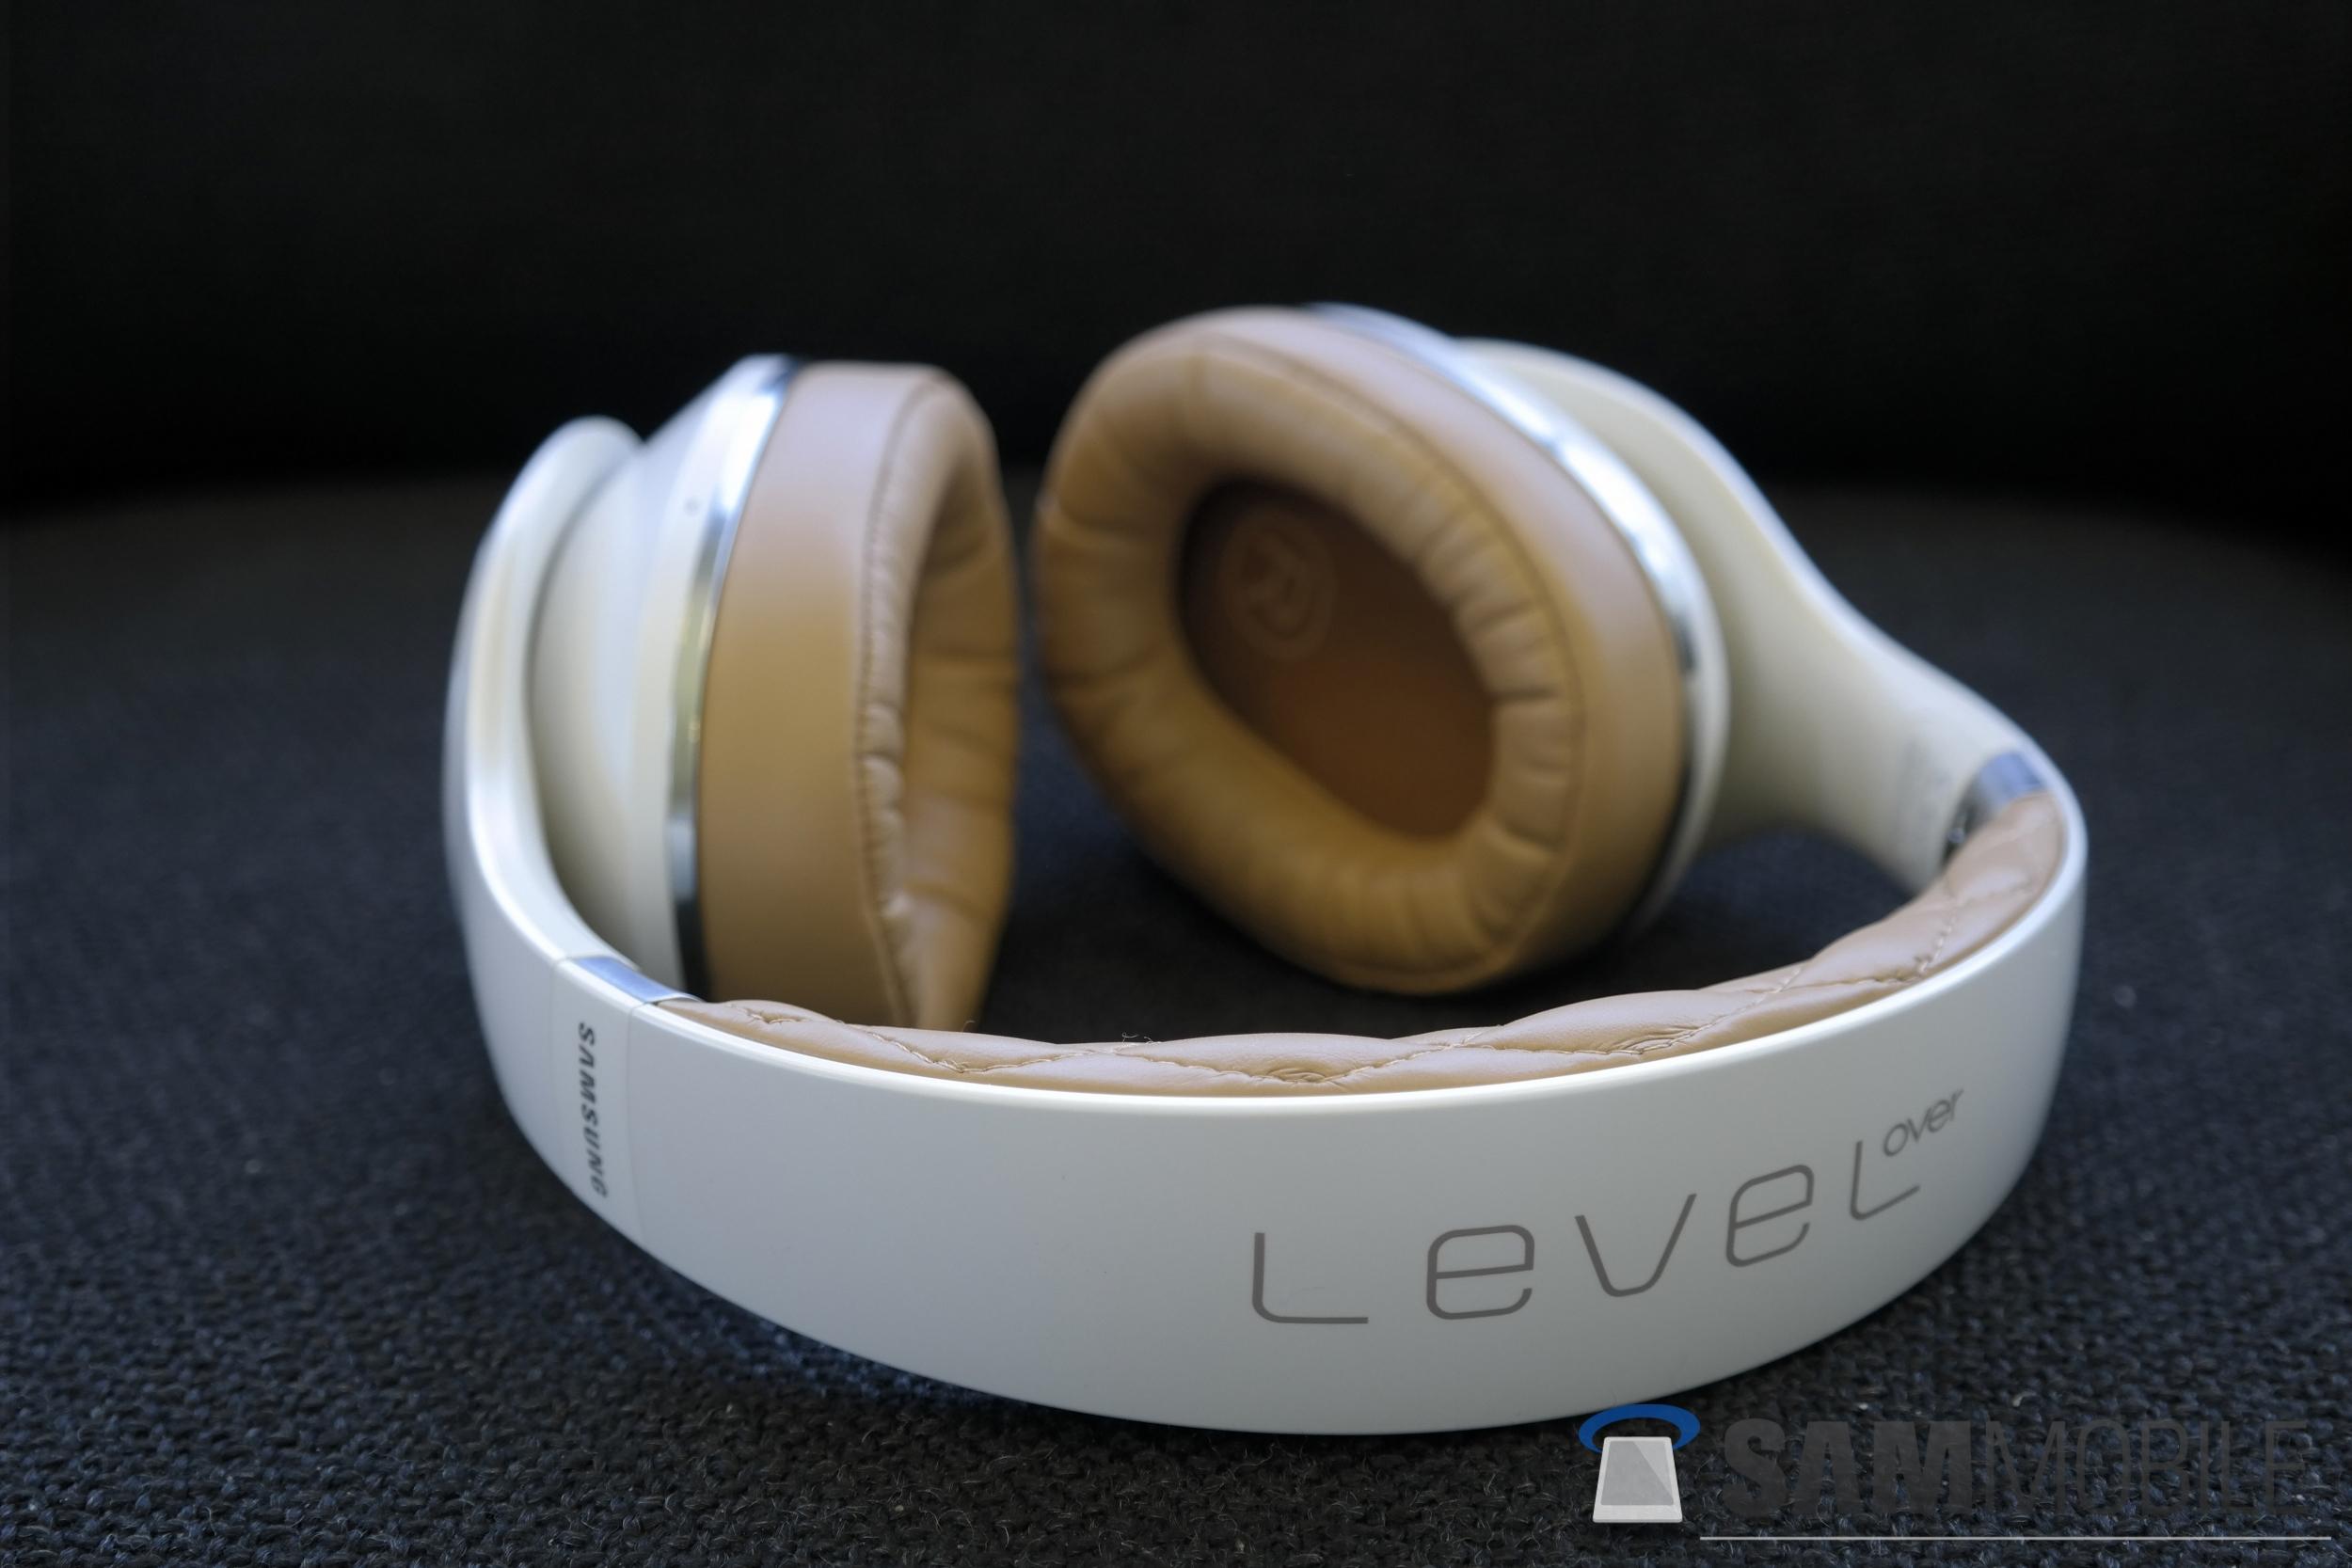 e3a59b61a49 Review: Samsung LEVELover (EO-AG9008) over-ear headphones ...